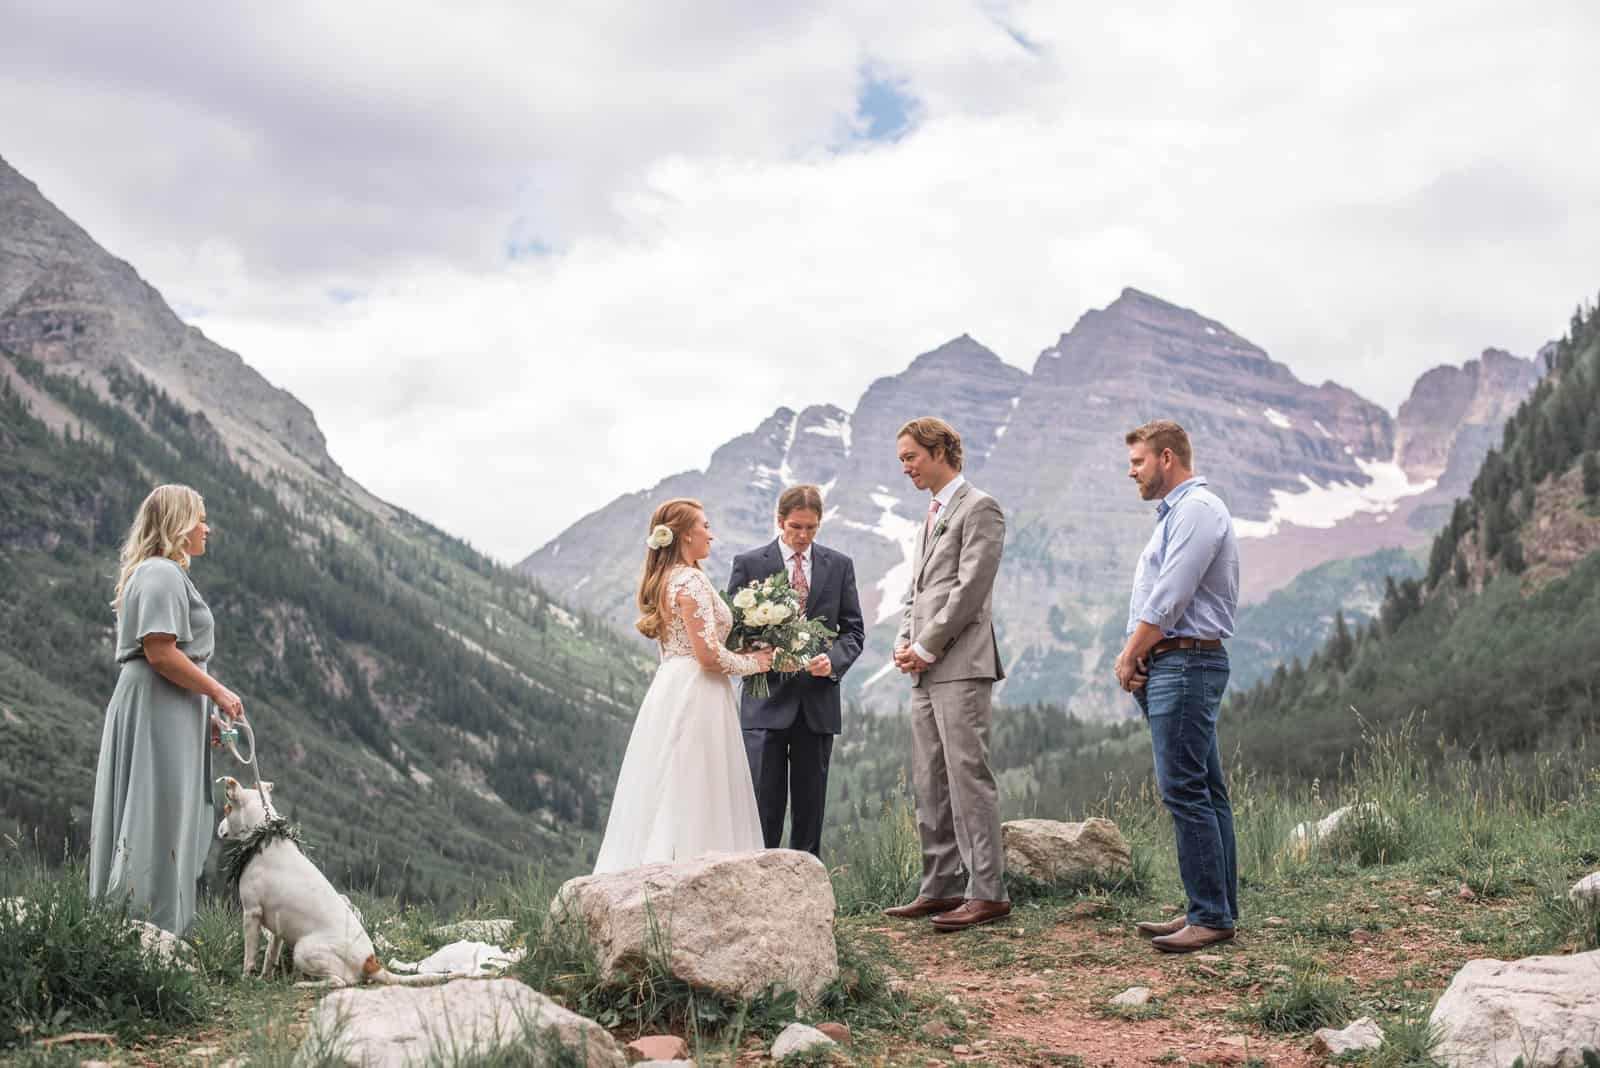 Aspen Wedding Photographer   Wedding at Maroon Bells Amphitheatre